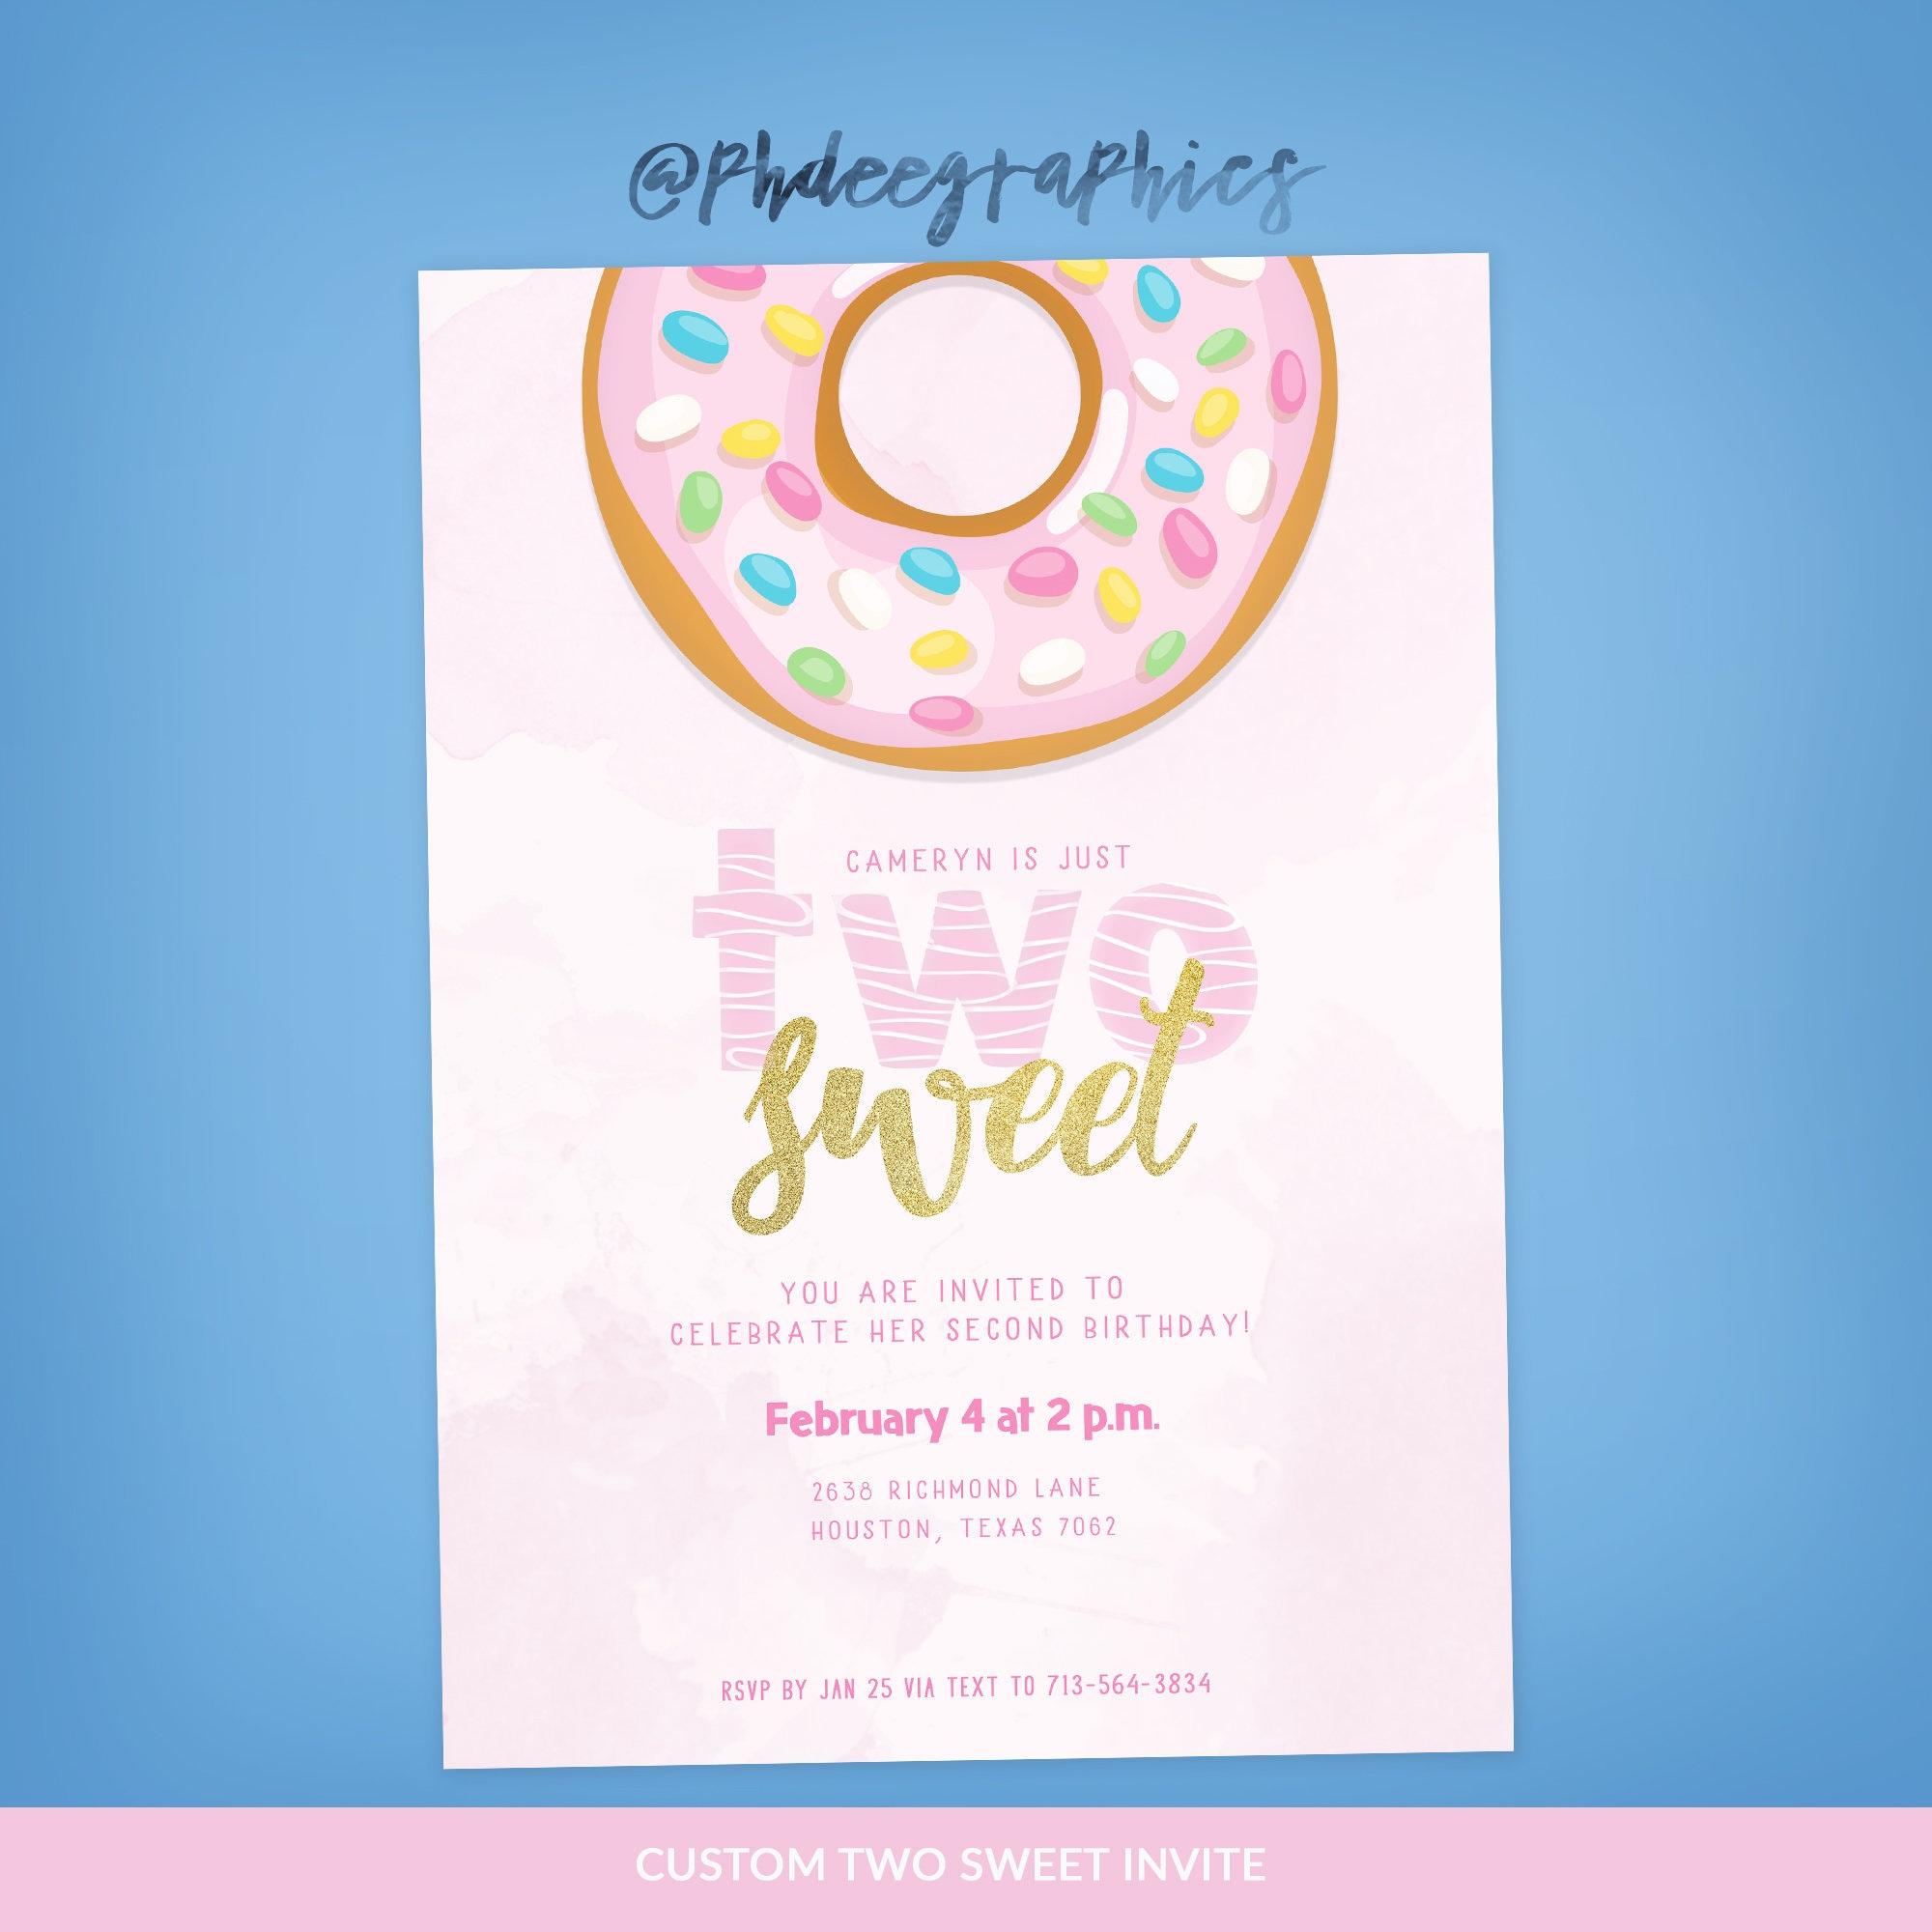 Two Sweet Invitation Donut Birthday Invite